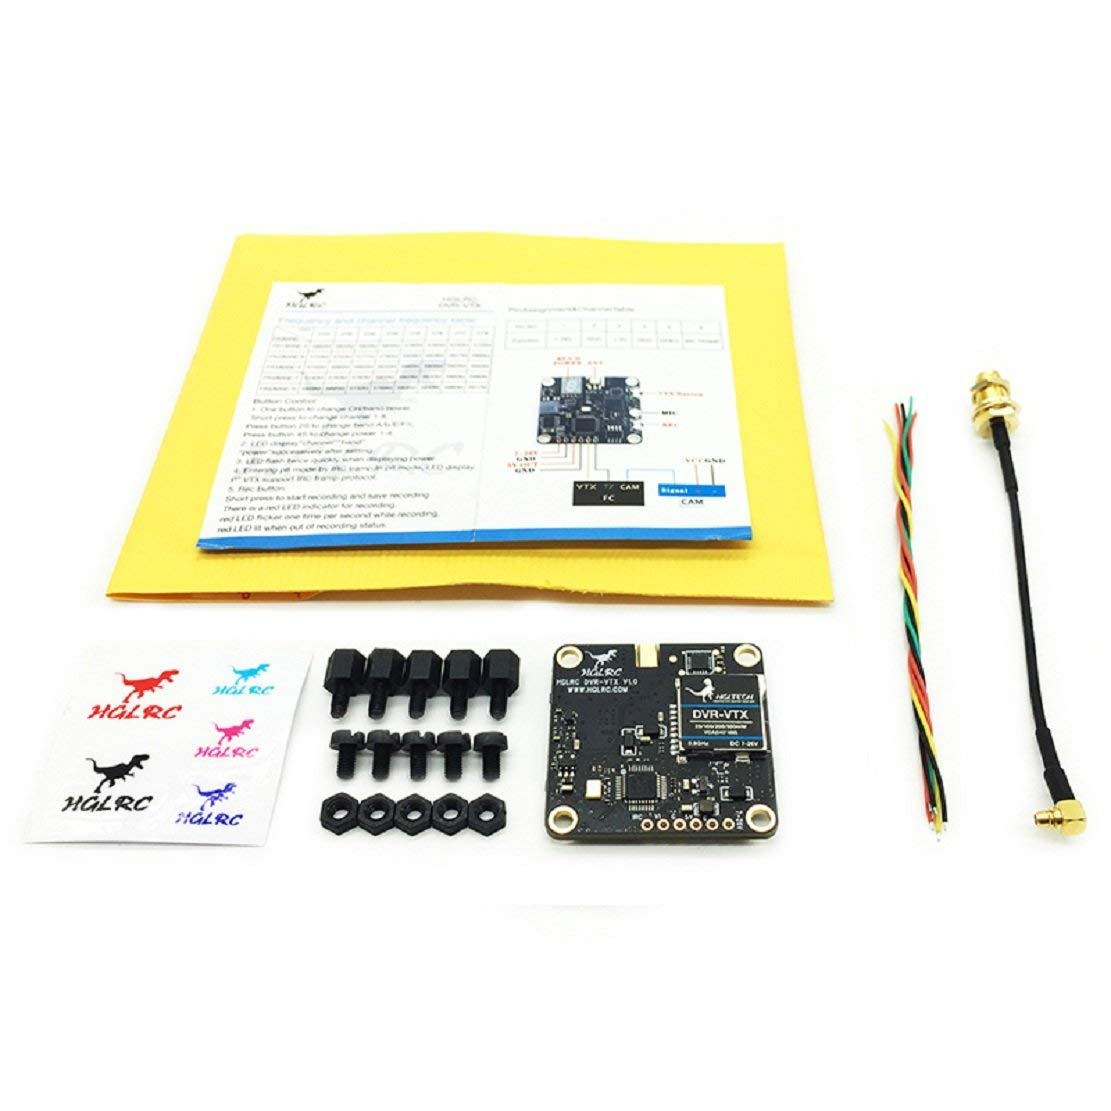 HGLRC 30.5*30.5 มม. 5.8 GHz 40CH DVR VTX FPV AIO เครื่องส่งสัญญาณ RP SMA หญิง/SMA หญิงสำหรับเครื่องส่งสัญญาณ FPV RC Drone-ใน ชิ้นส่วนและอุปกรณ์เสริม จาก ของเล่นและงานอดิเรก บน AliExpress - 11.11_สิบเอ็ด สิบเอ็ดวันคนโสด 1